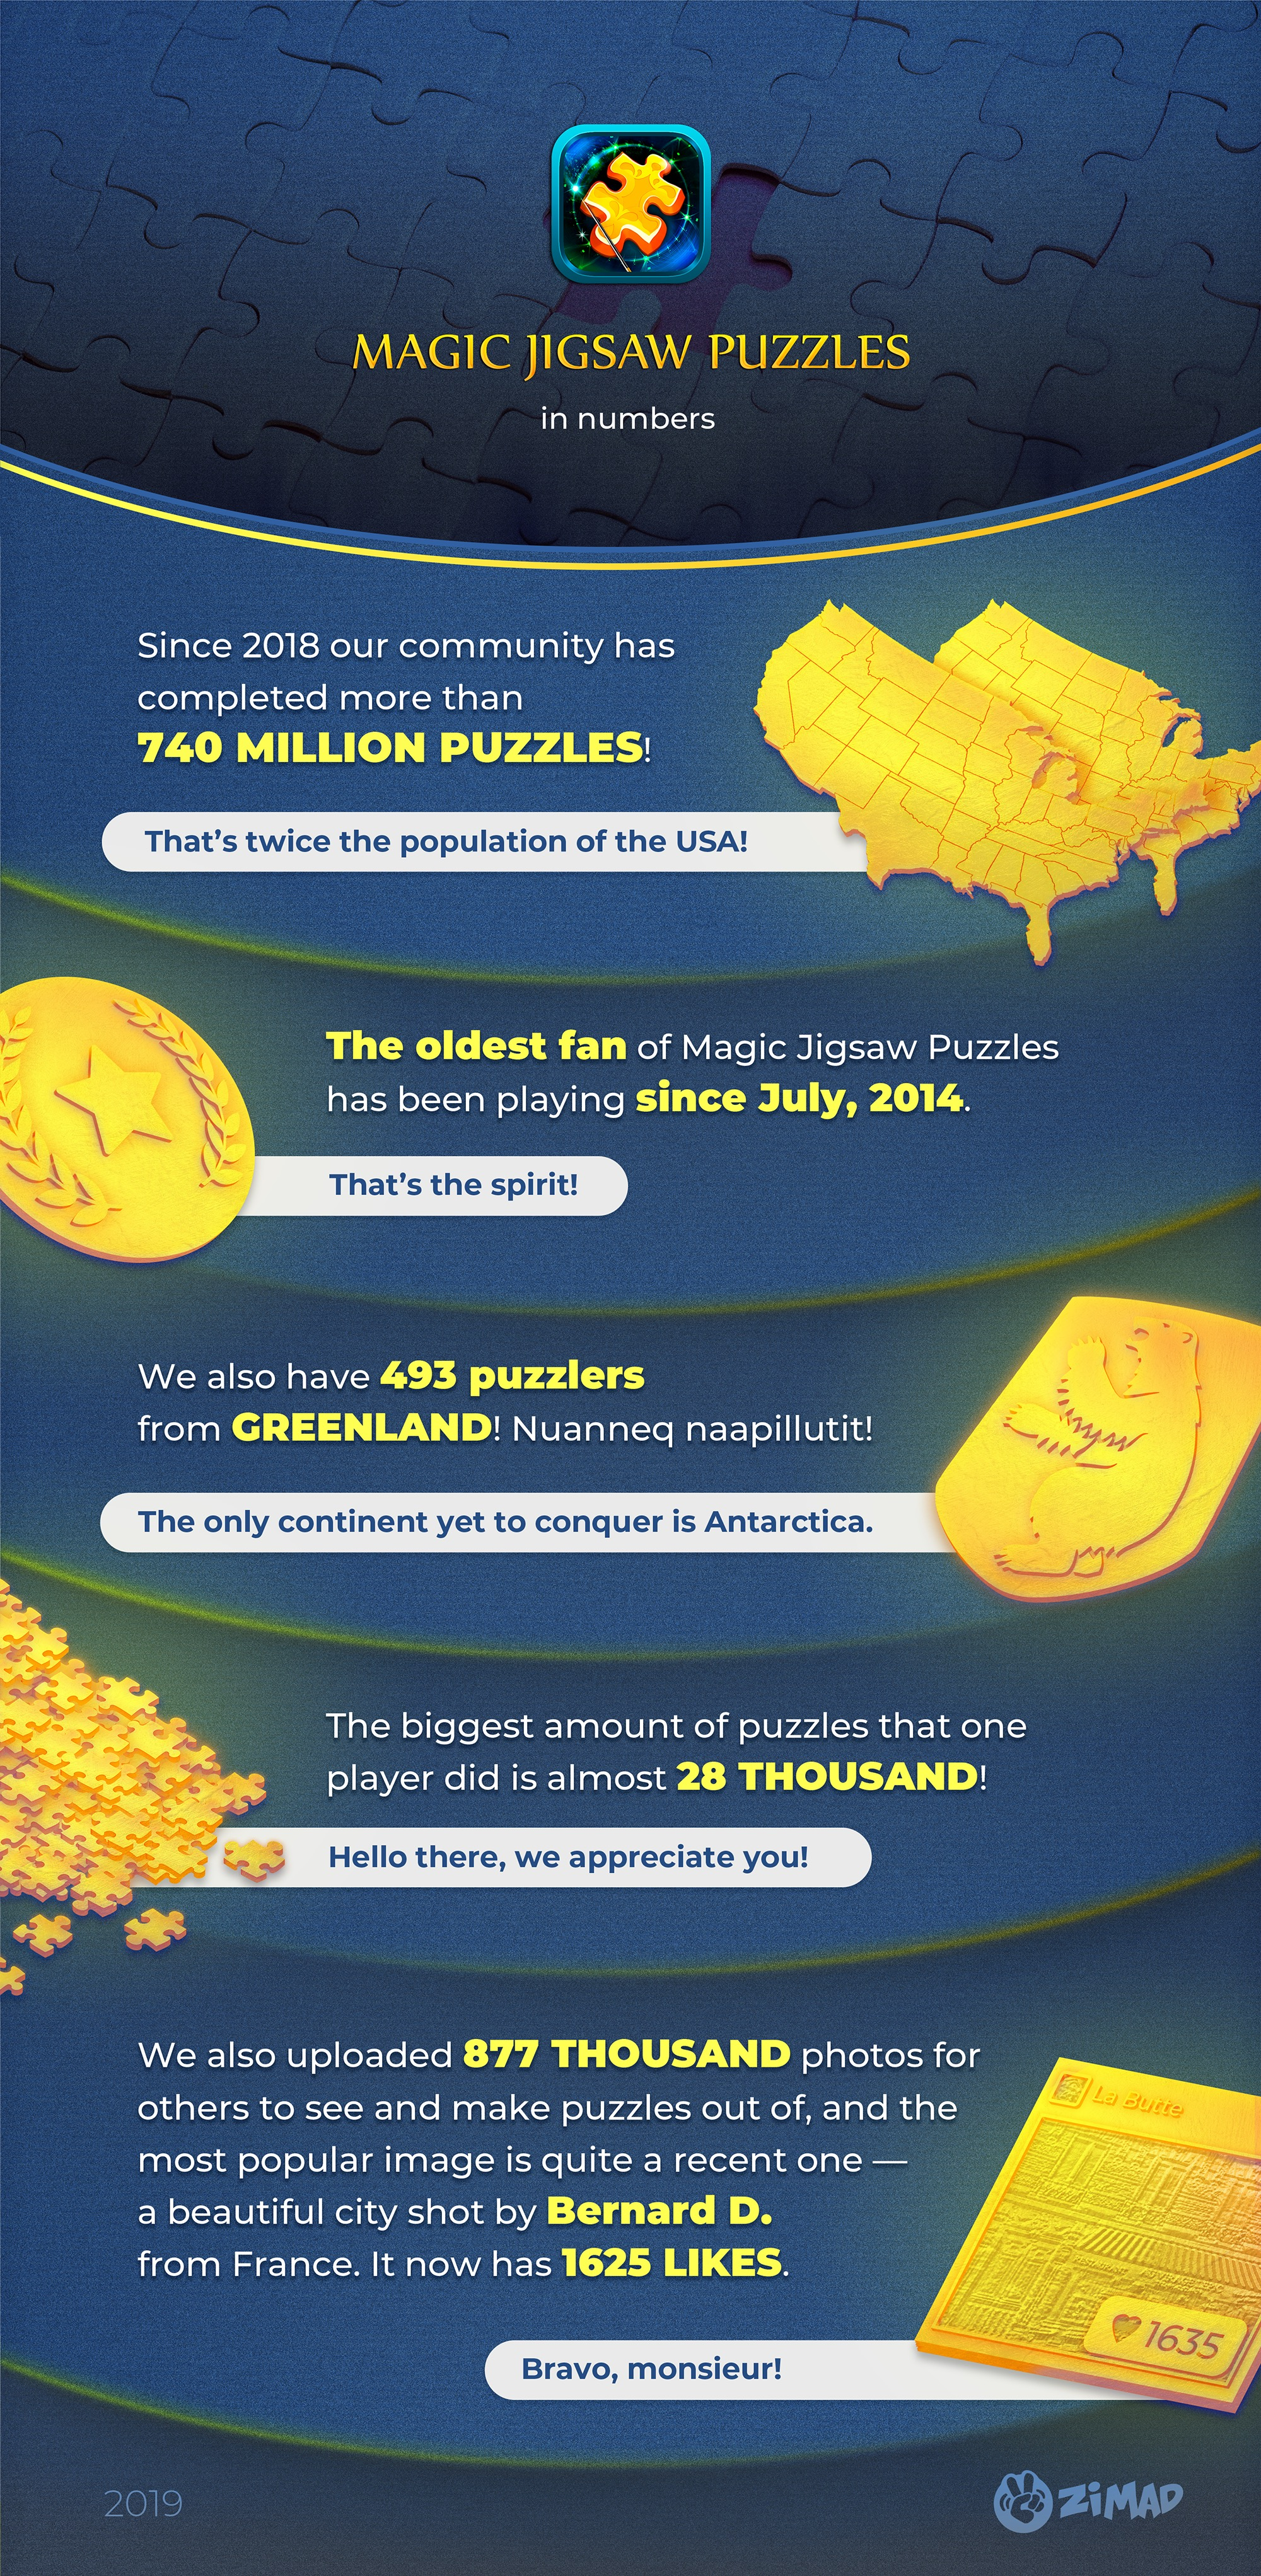 Magic Jigsaw Puzzles celebration infographic